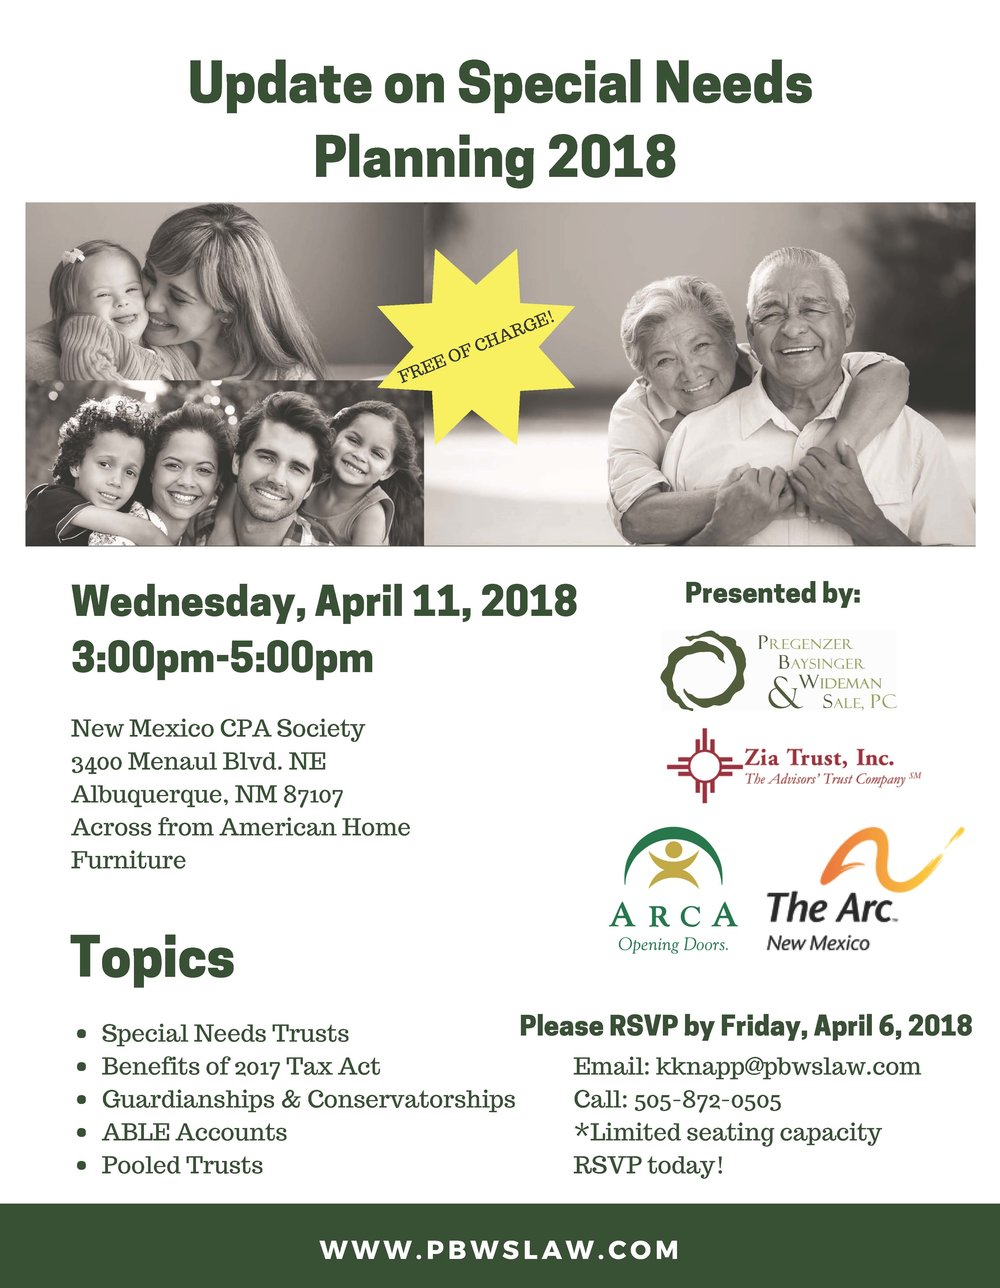 2018 Update on Special Needs Planning Flyer.jpg